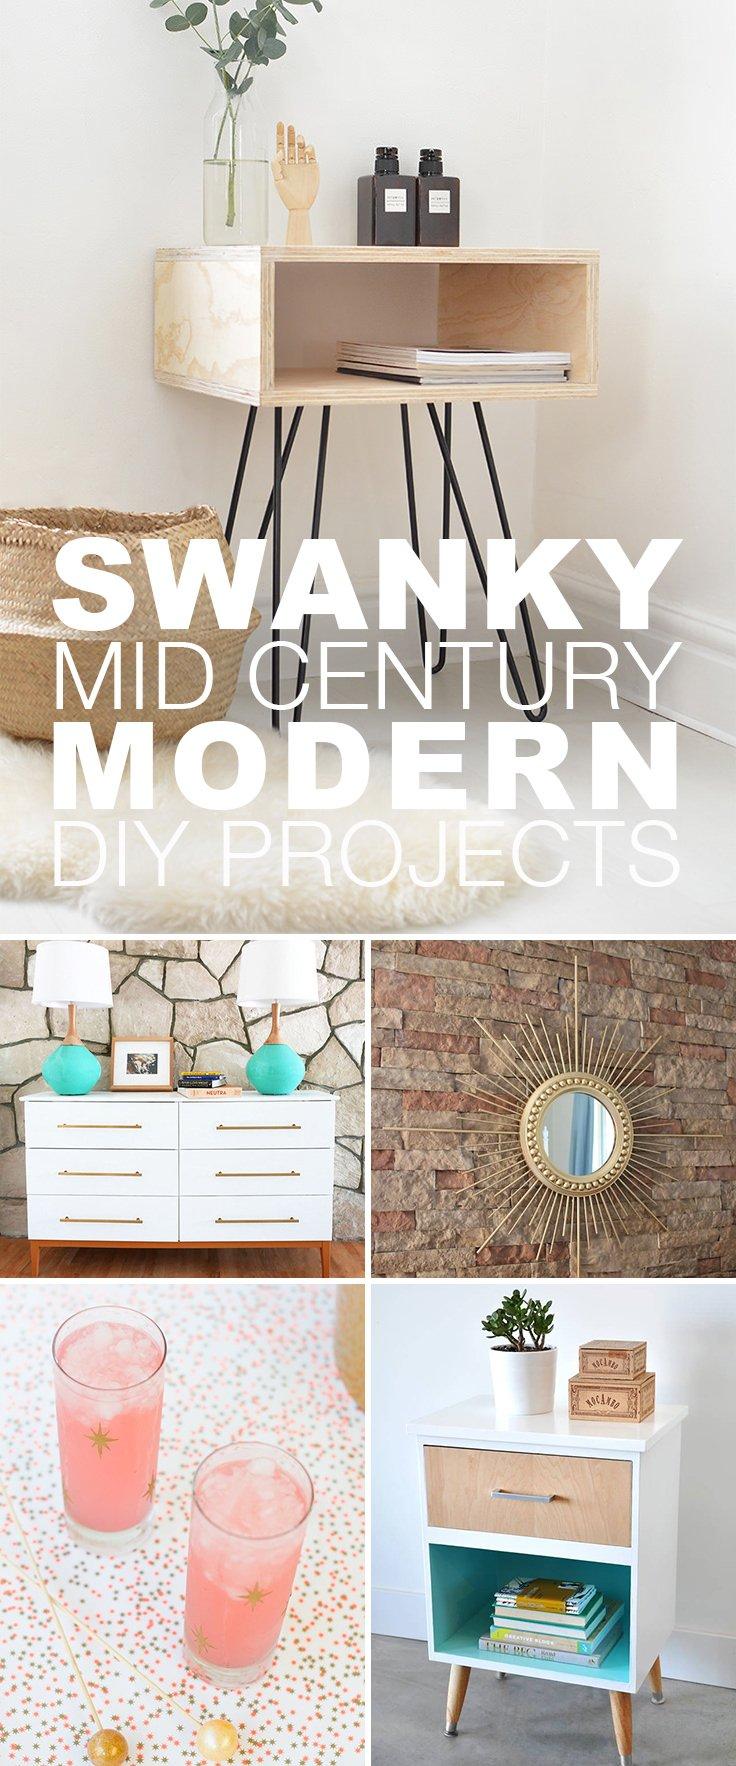 15 swanky mid century modern diy projects